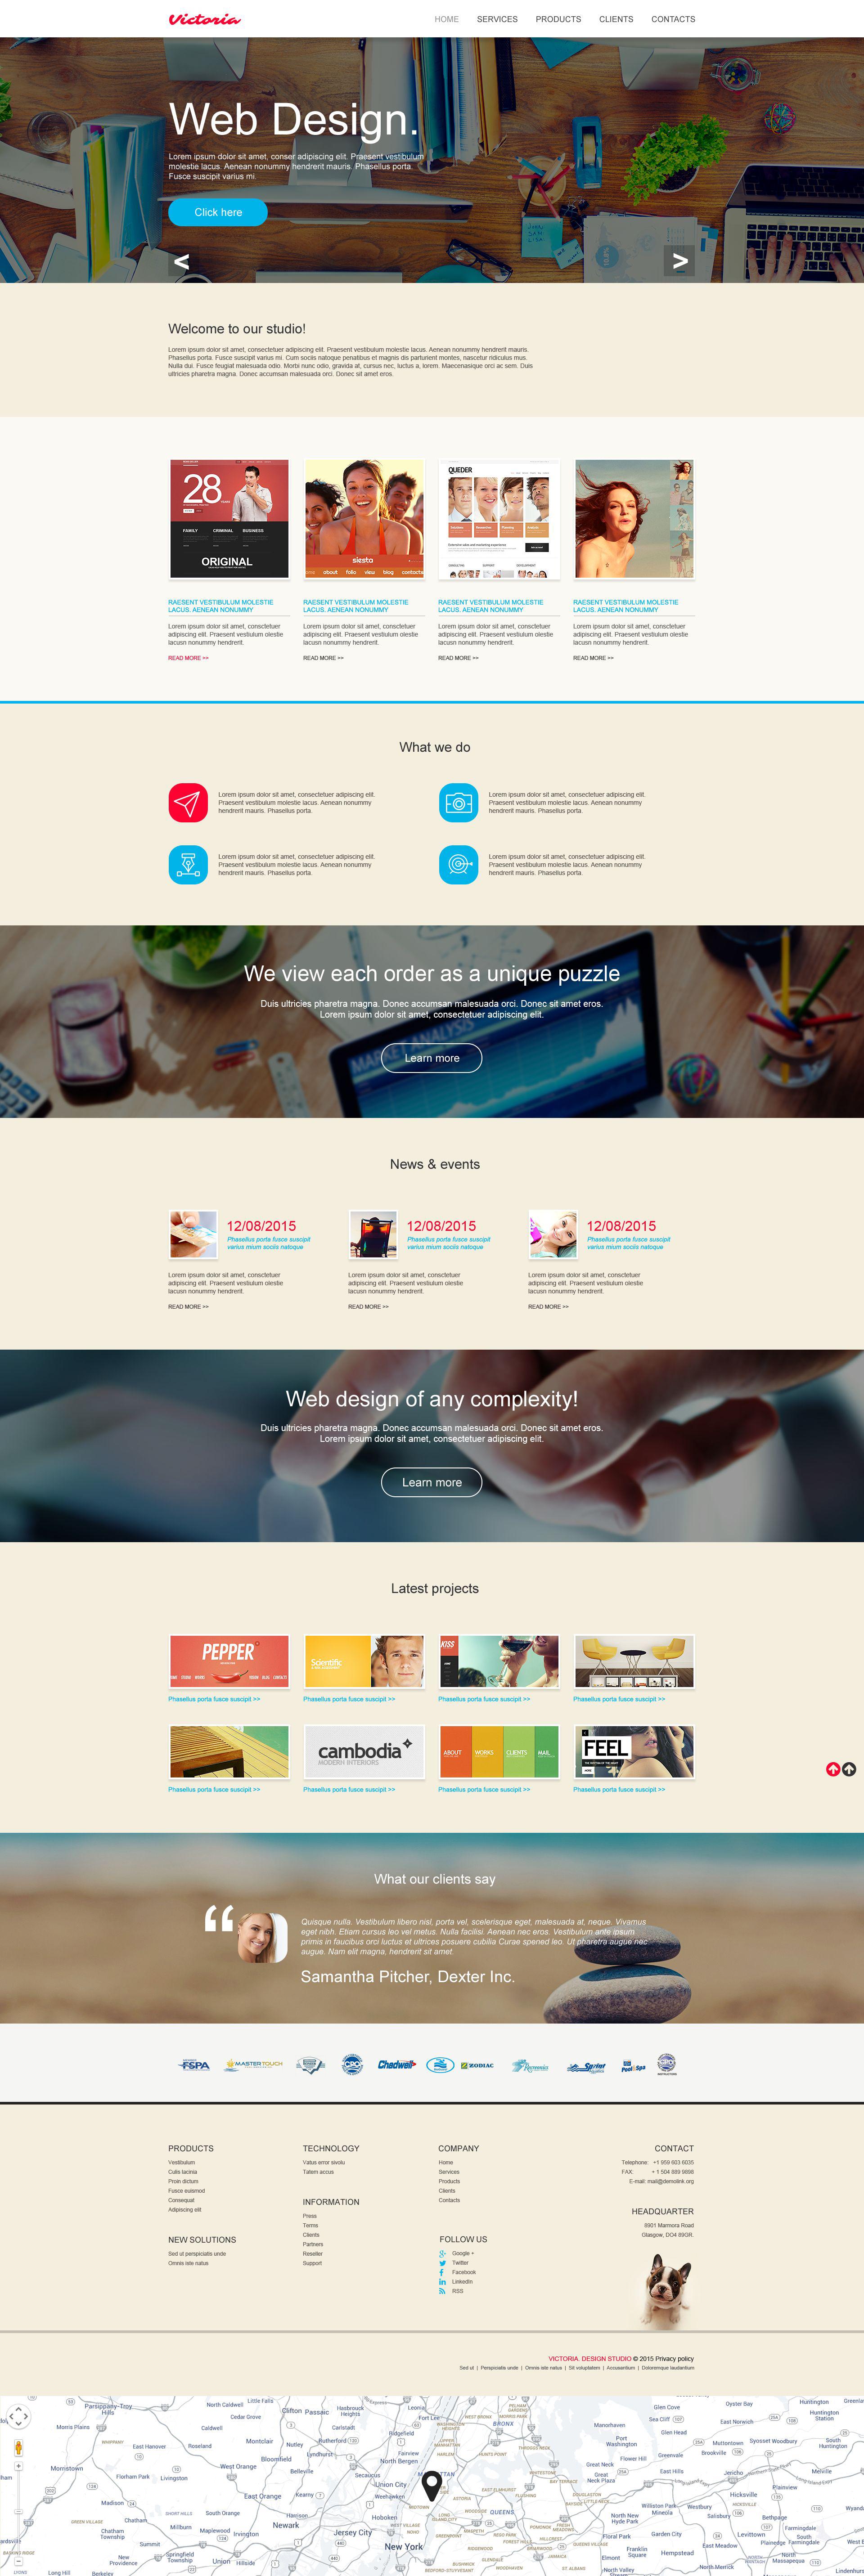 Muse Template für Web Design #53463 - Screenshot